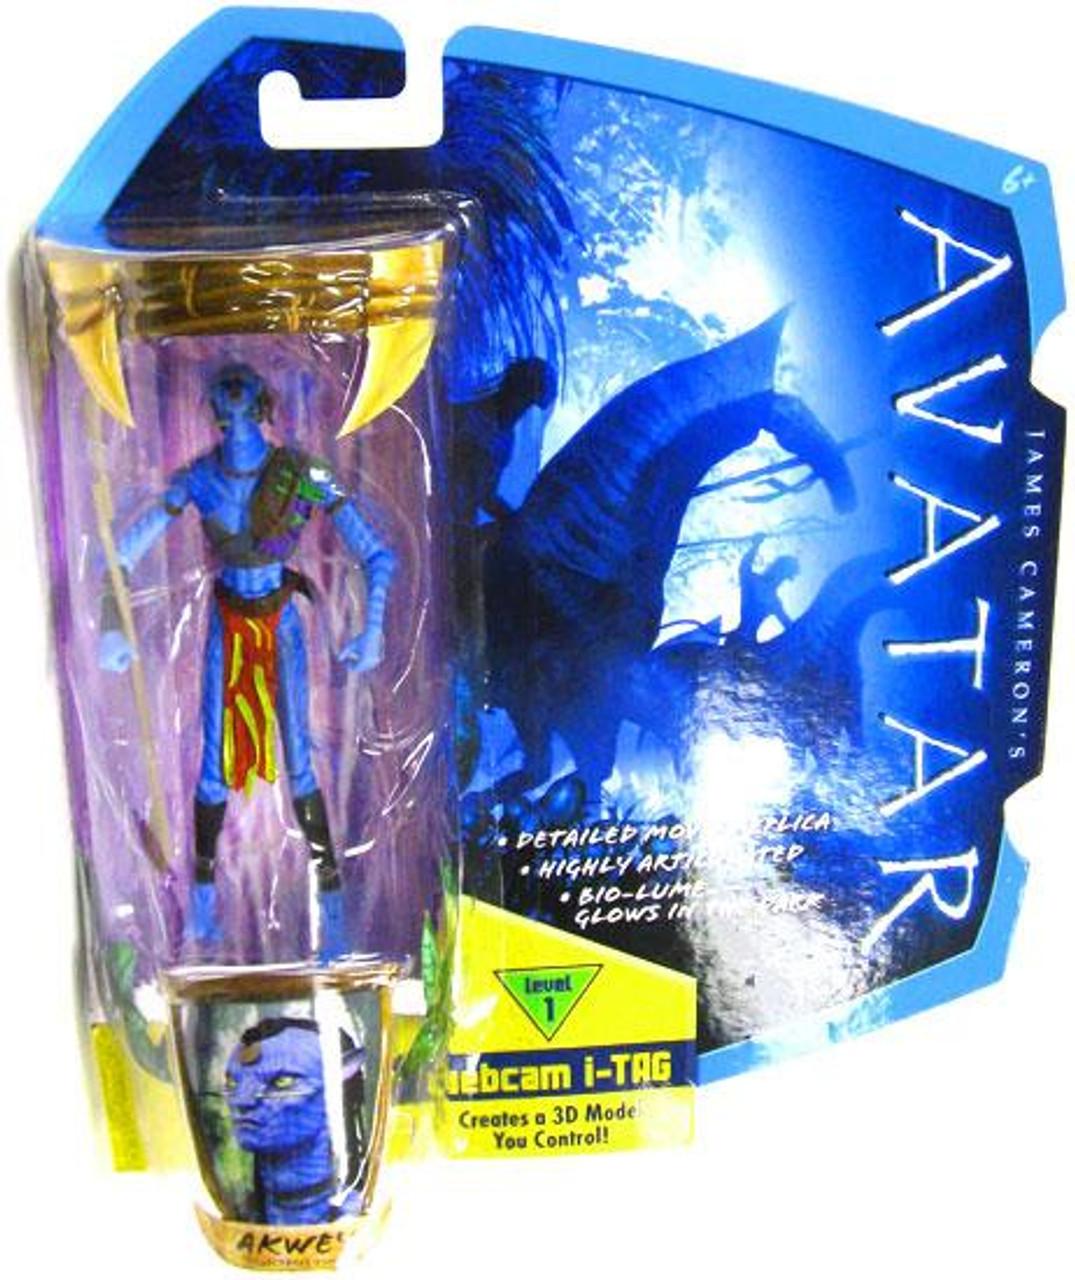 James Cameron's Avatar Akwey Action Figure